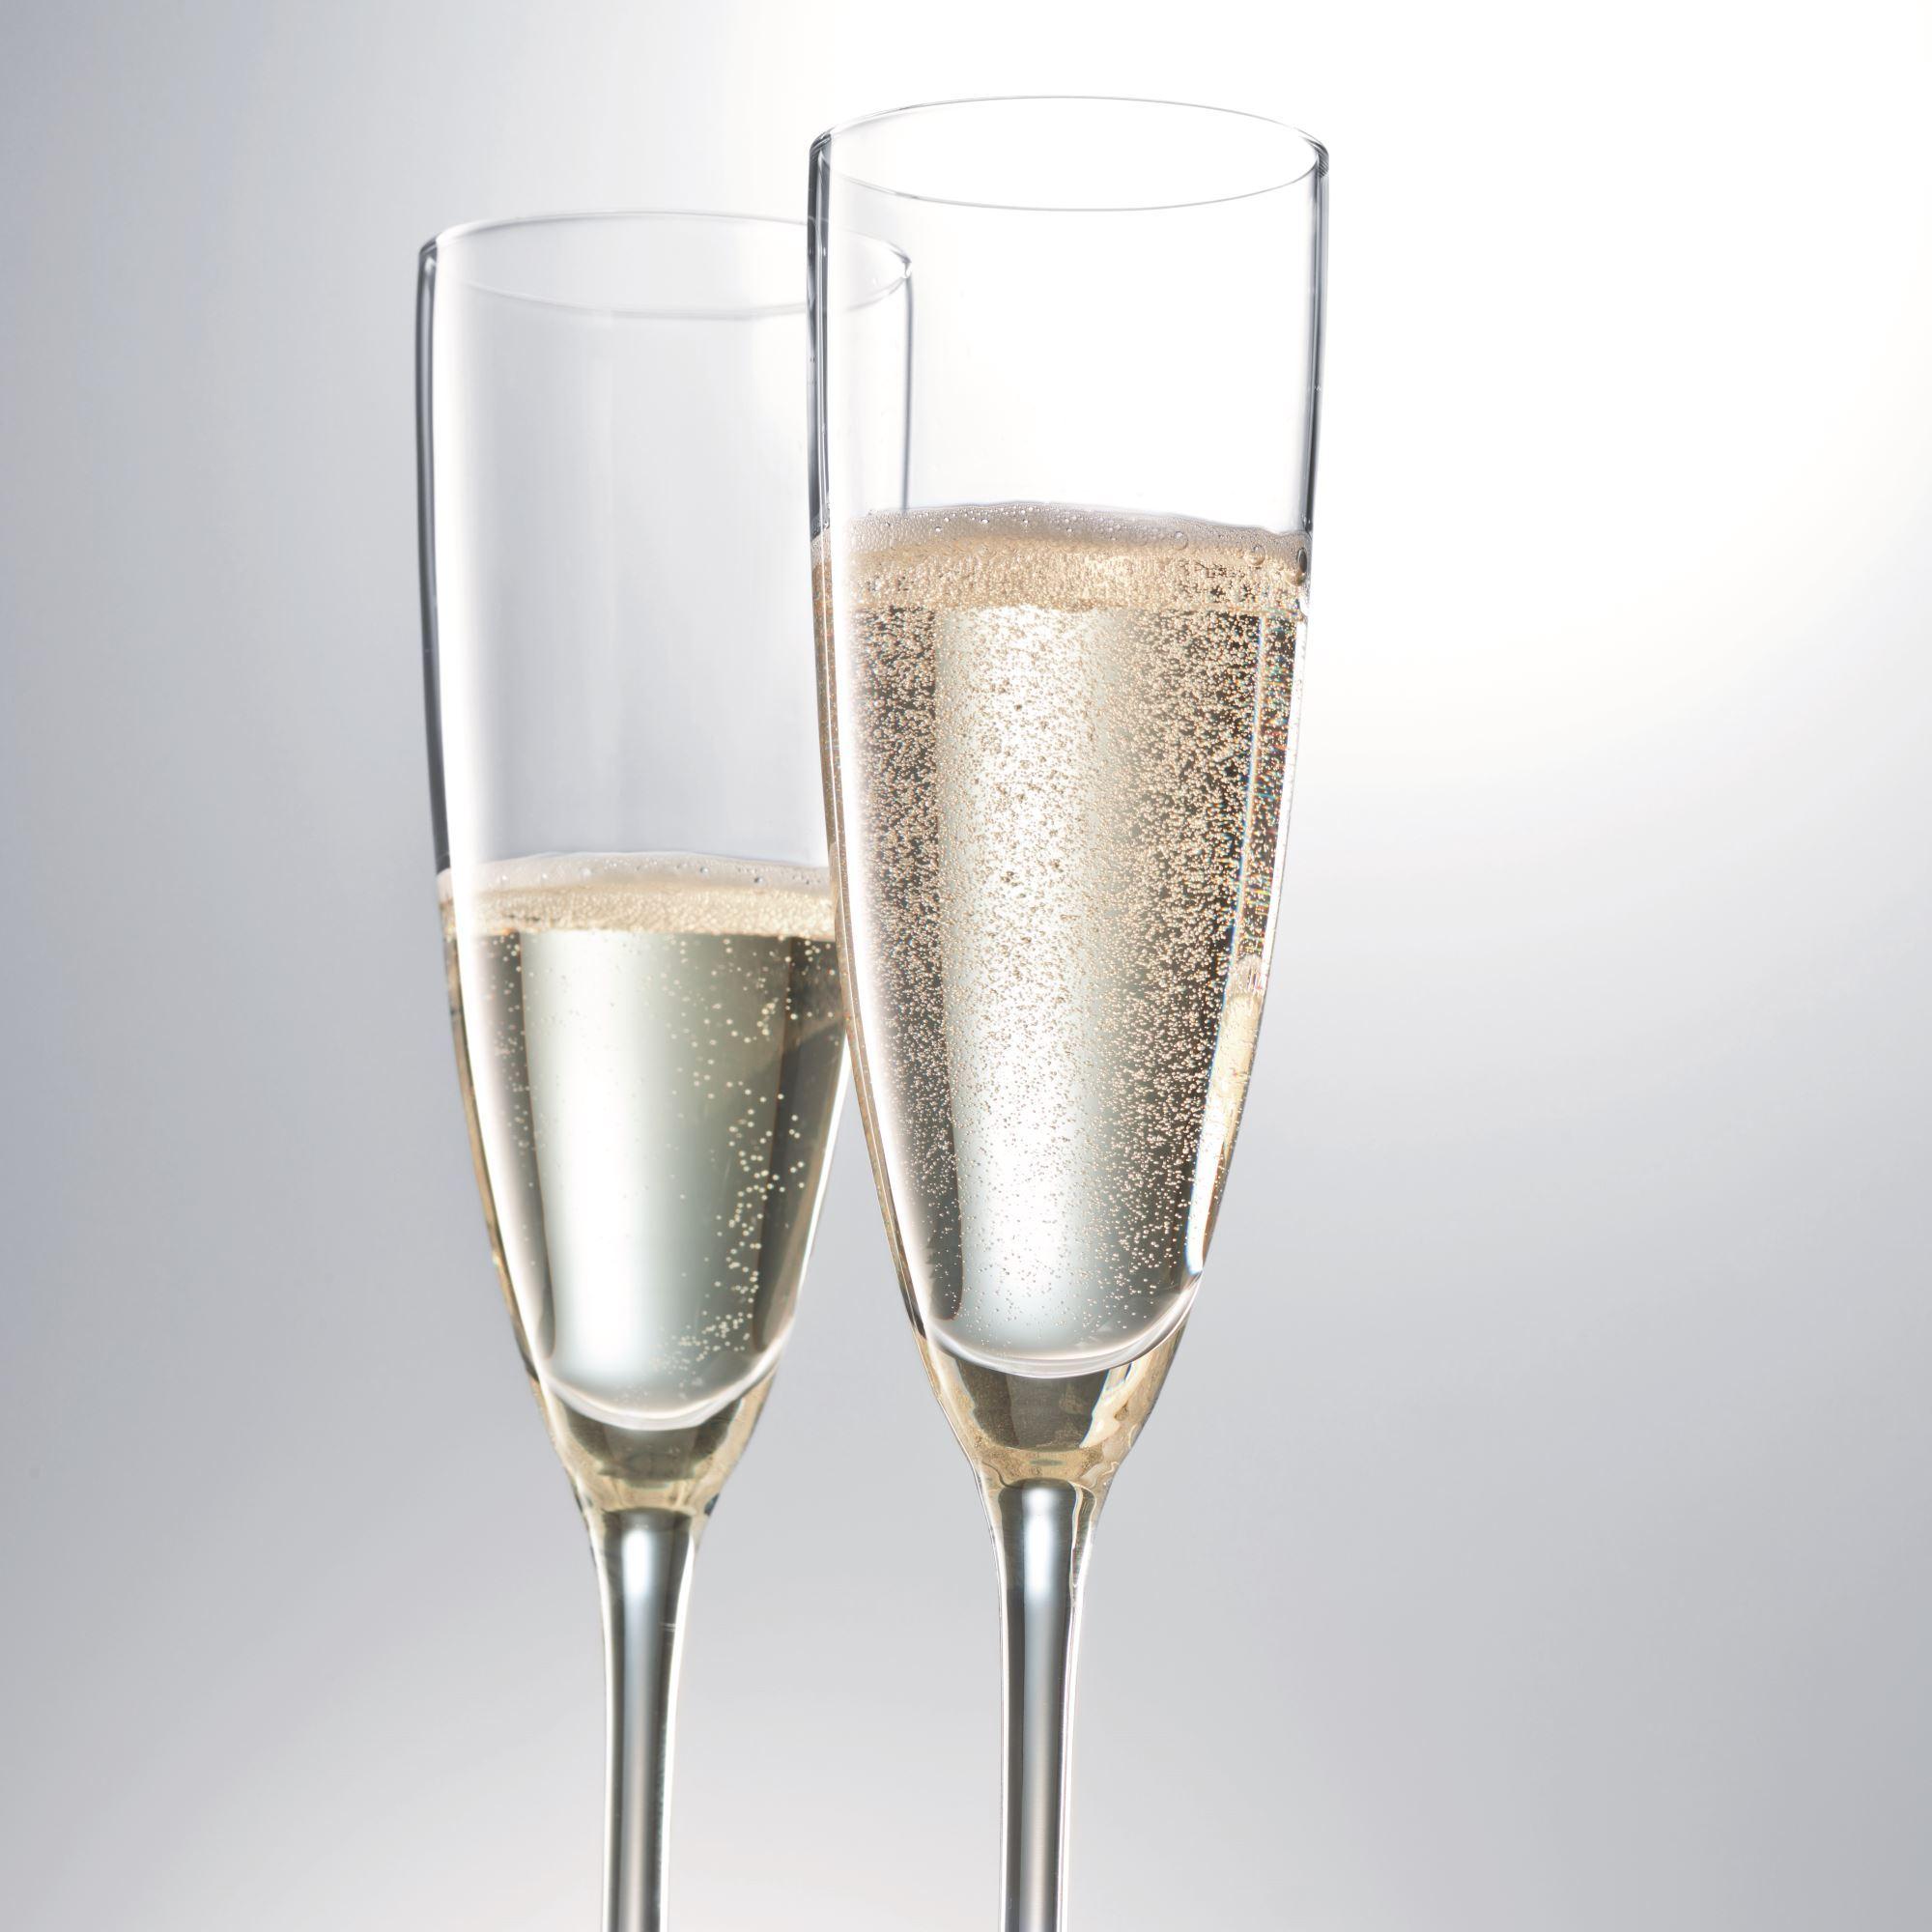 Kit de Taças Água ou Vinho e Champagne Schott Zwiesel Classico 12 Peças de Cristal